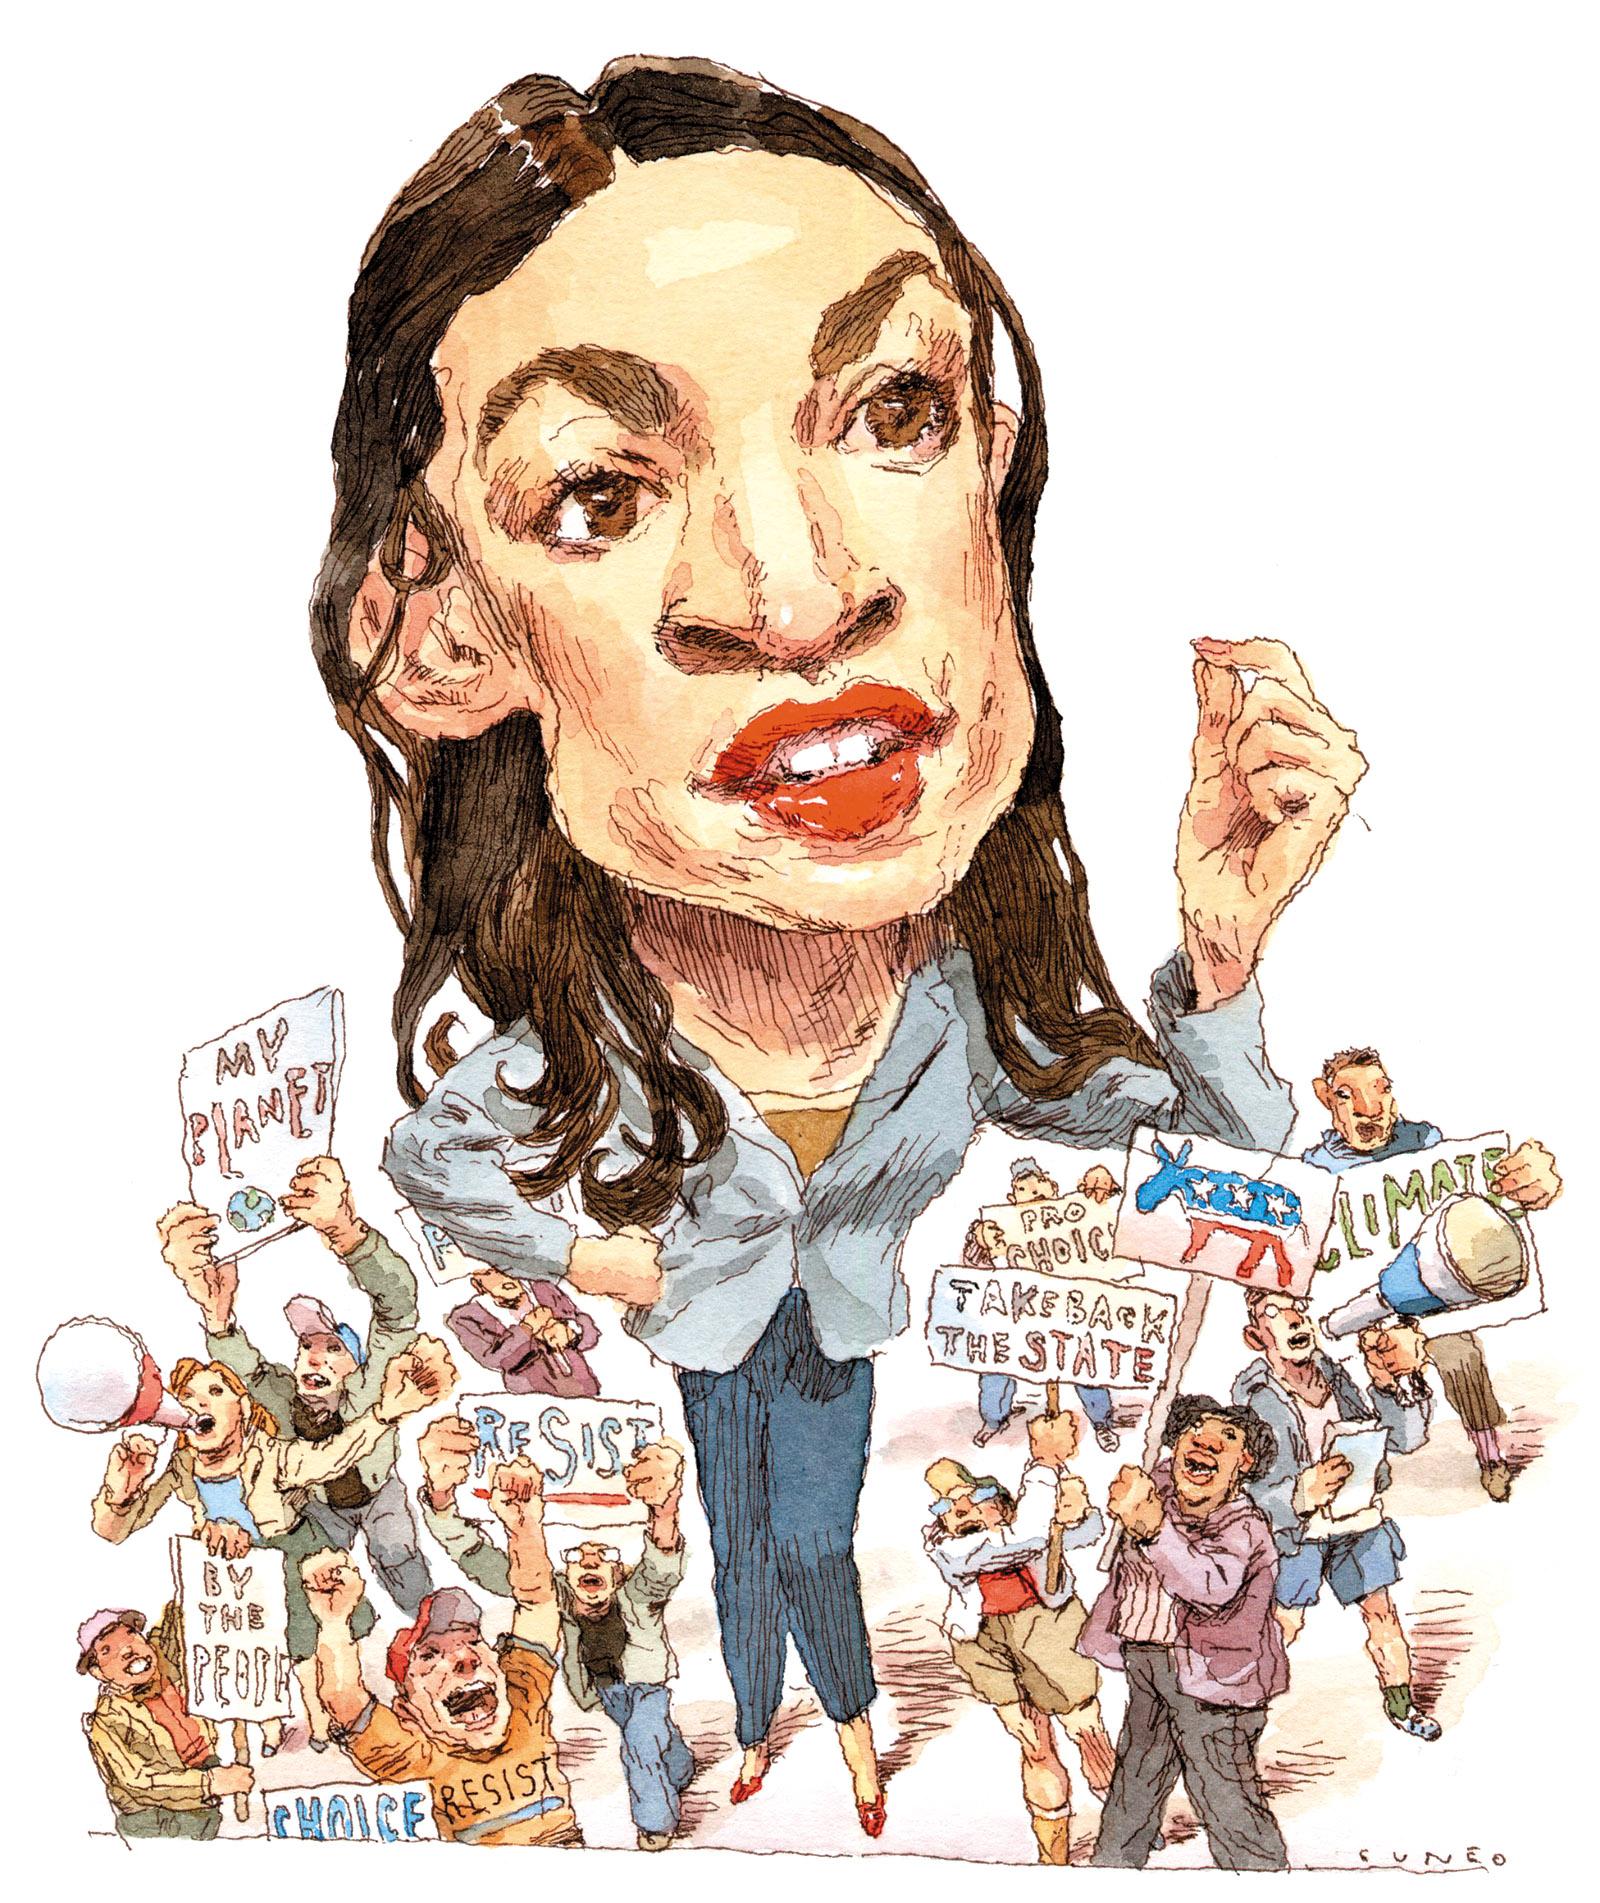 Alexandria Ocasio-Cortez; drawing by John Cuneo